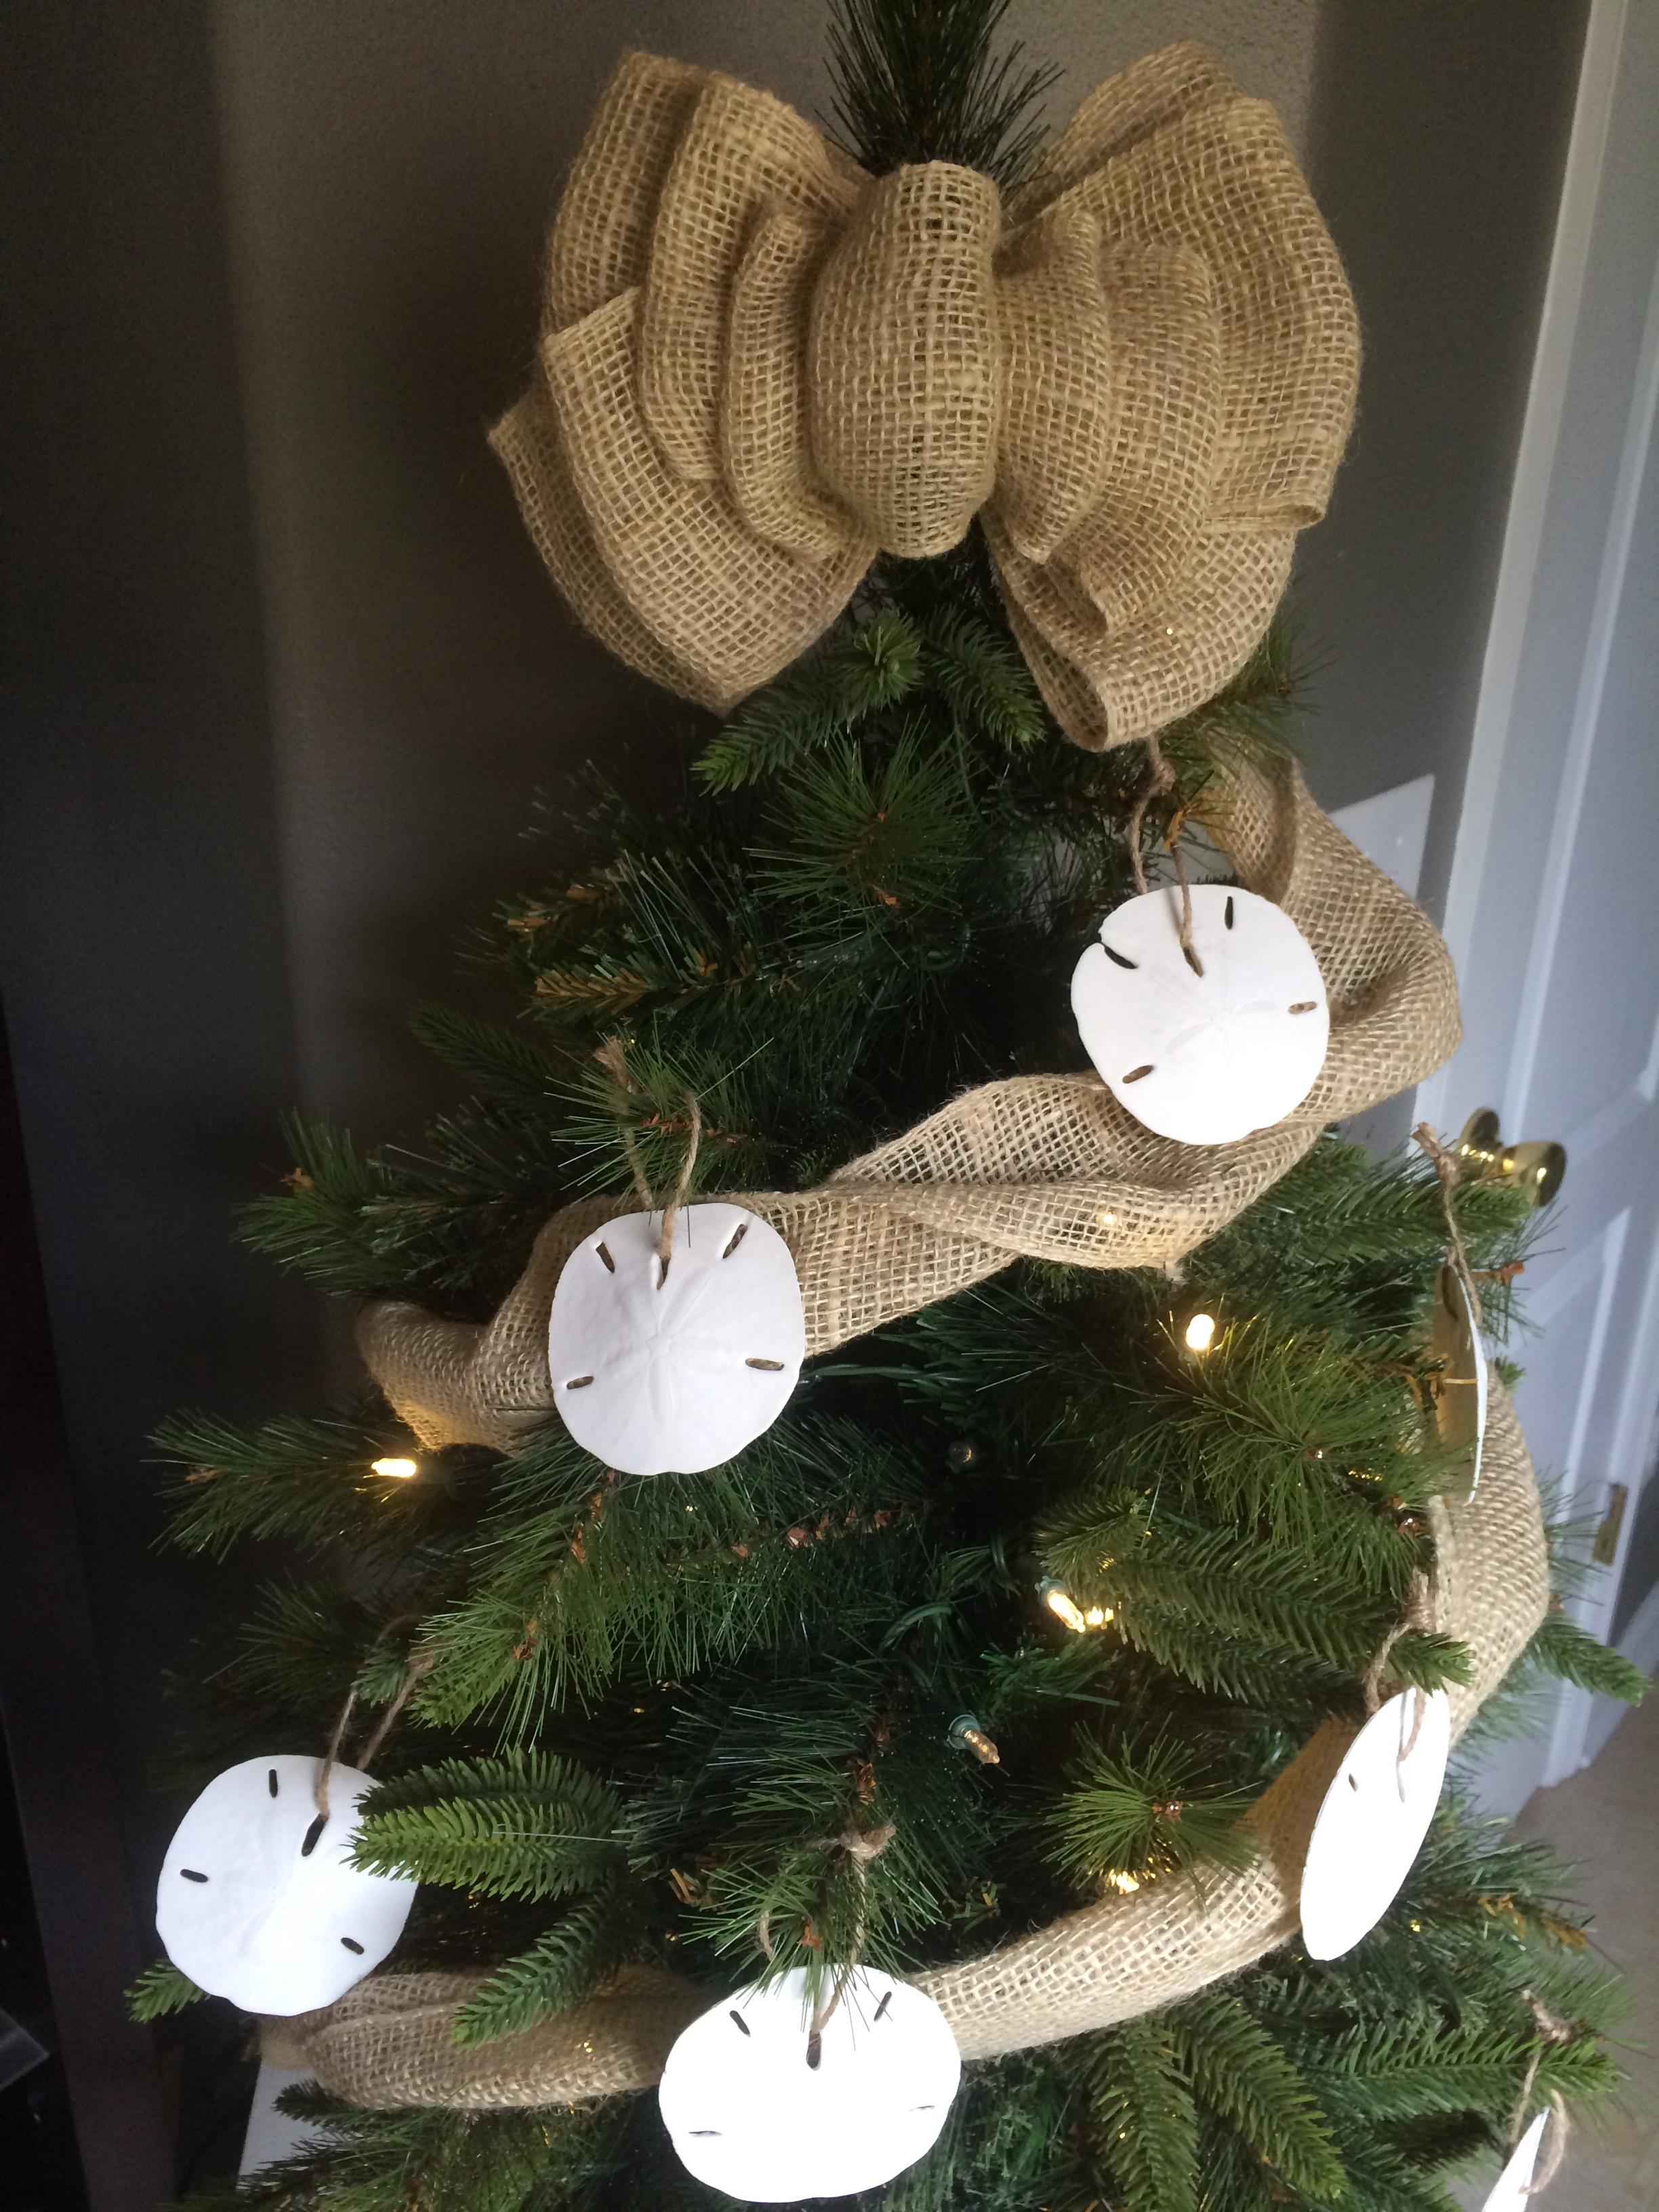 Beach themed christmas ornaments - Beach Inspired Christmas Tree Decorations